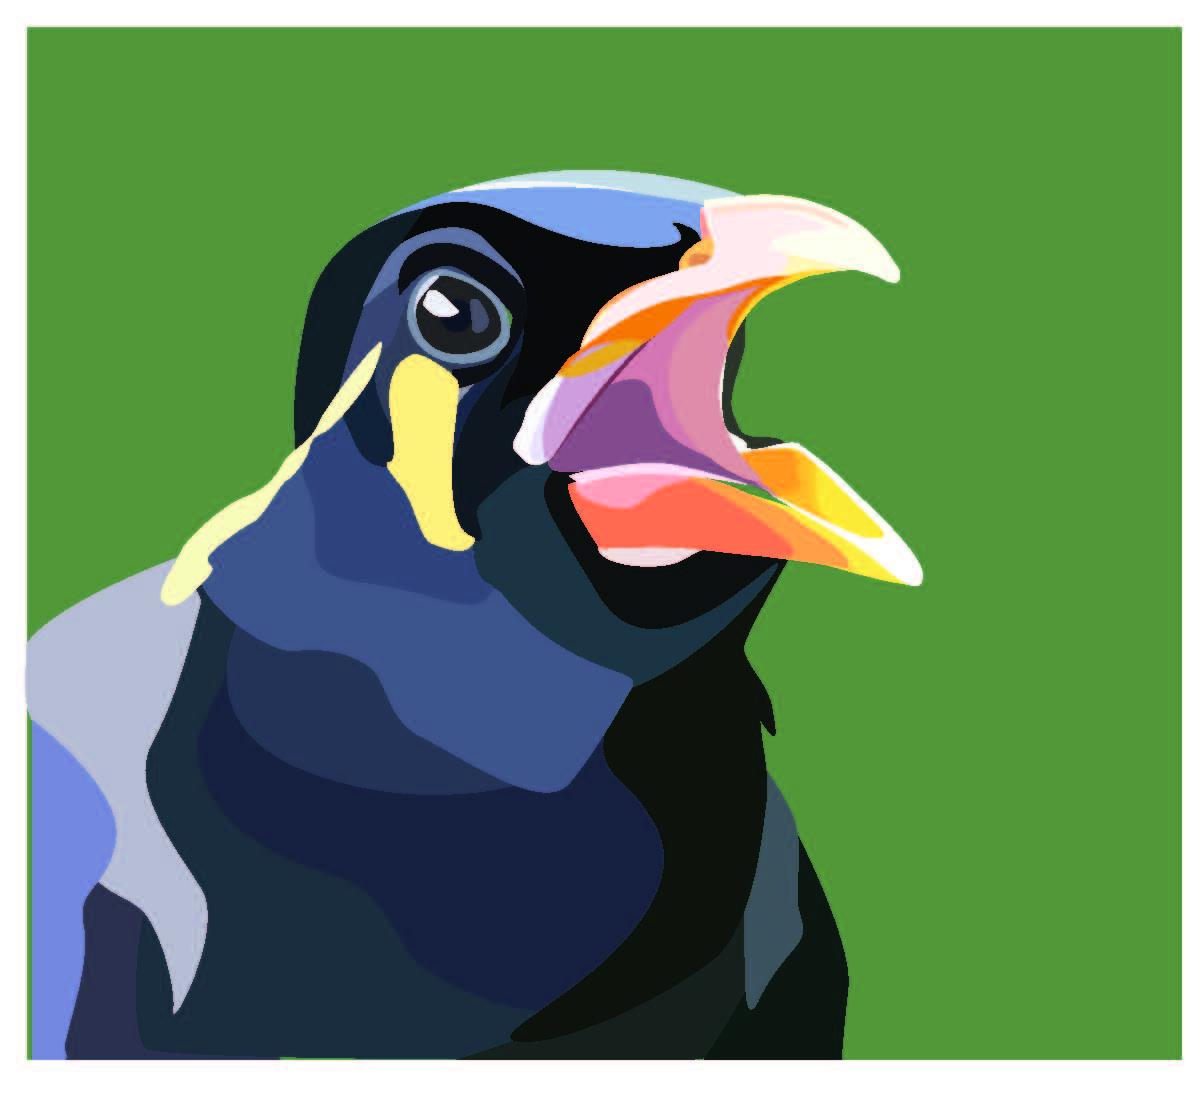 Mynah bird illustration